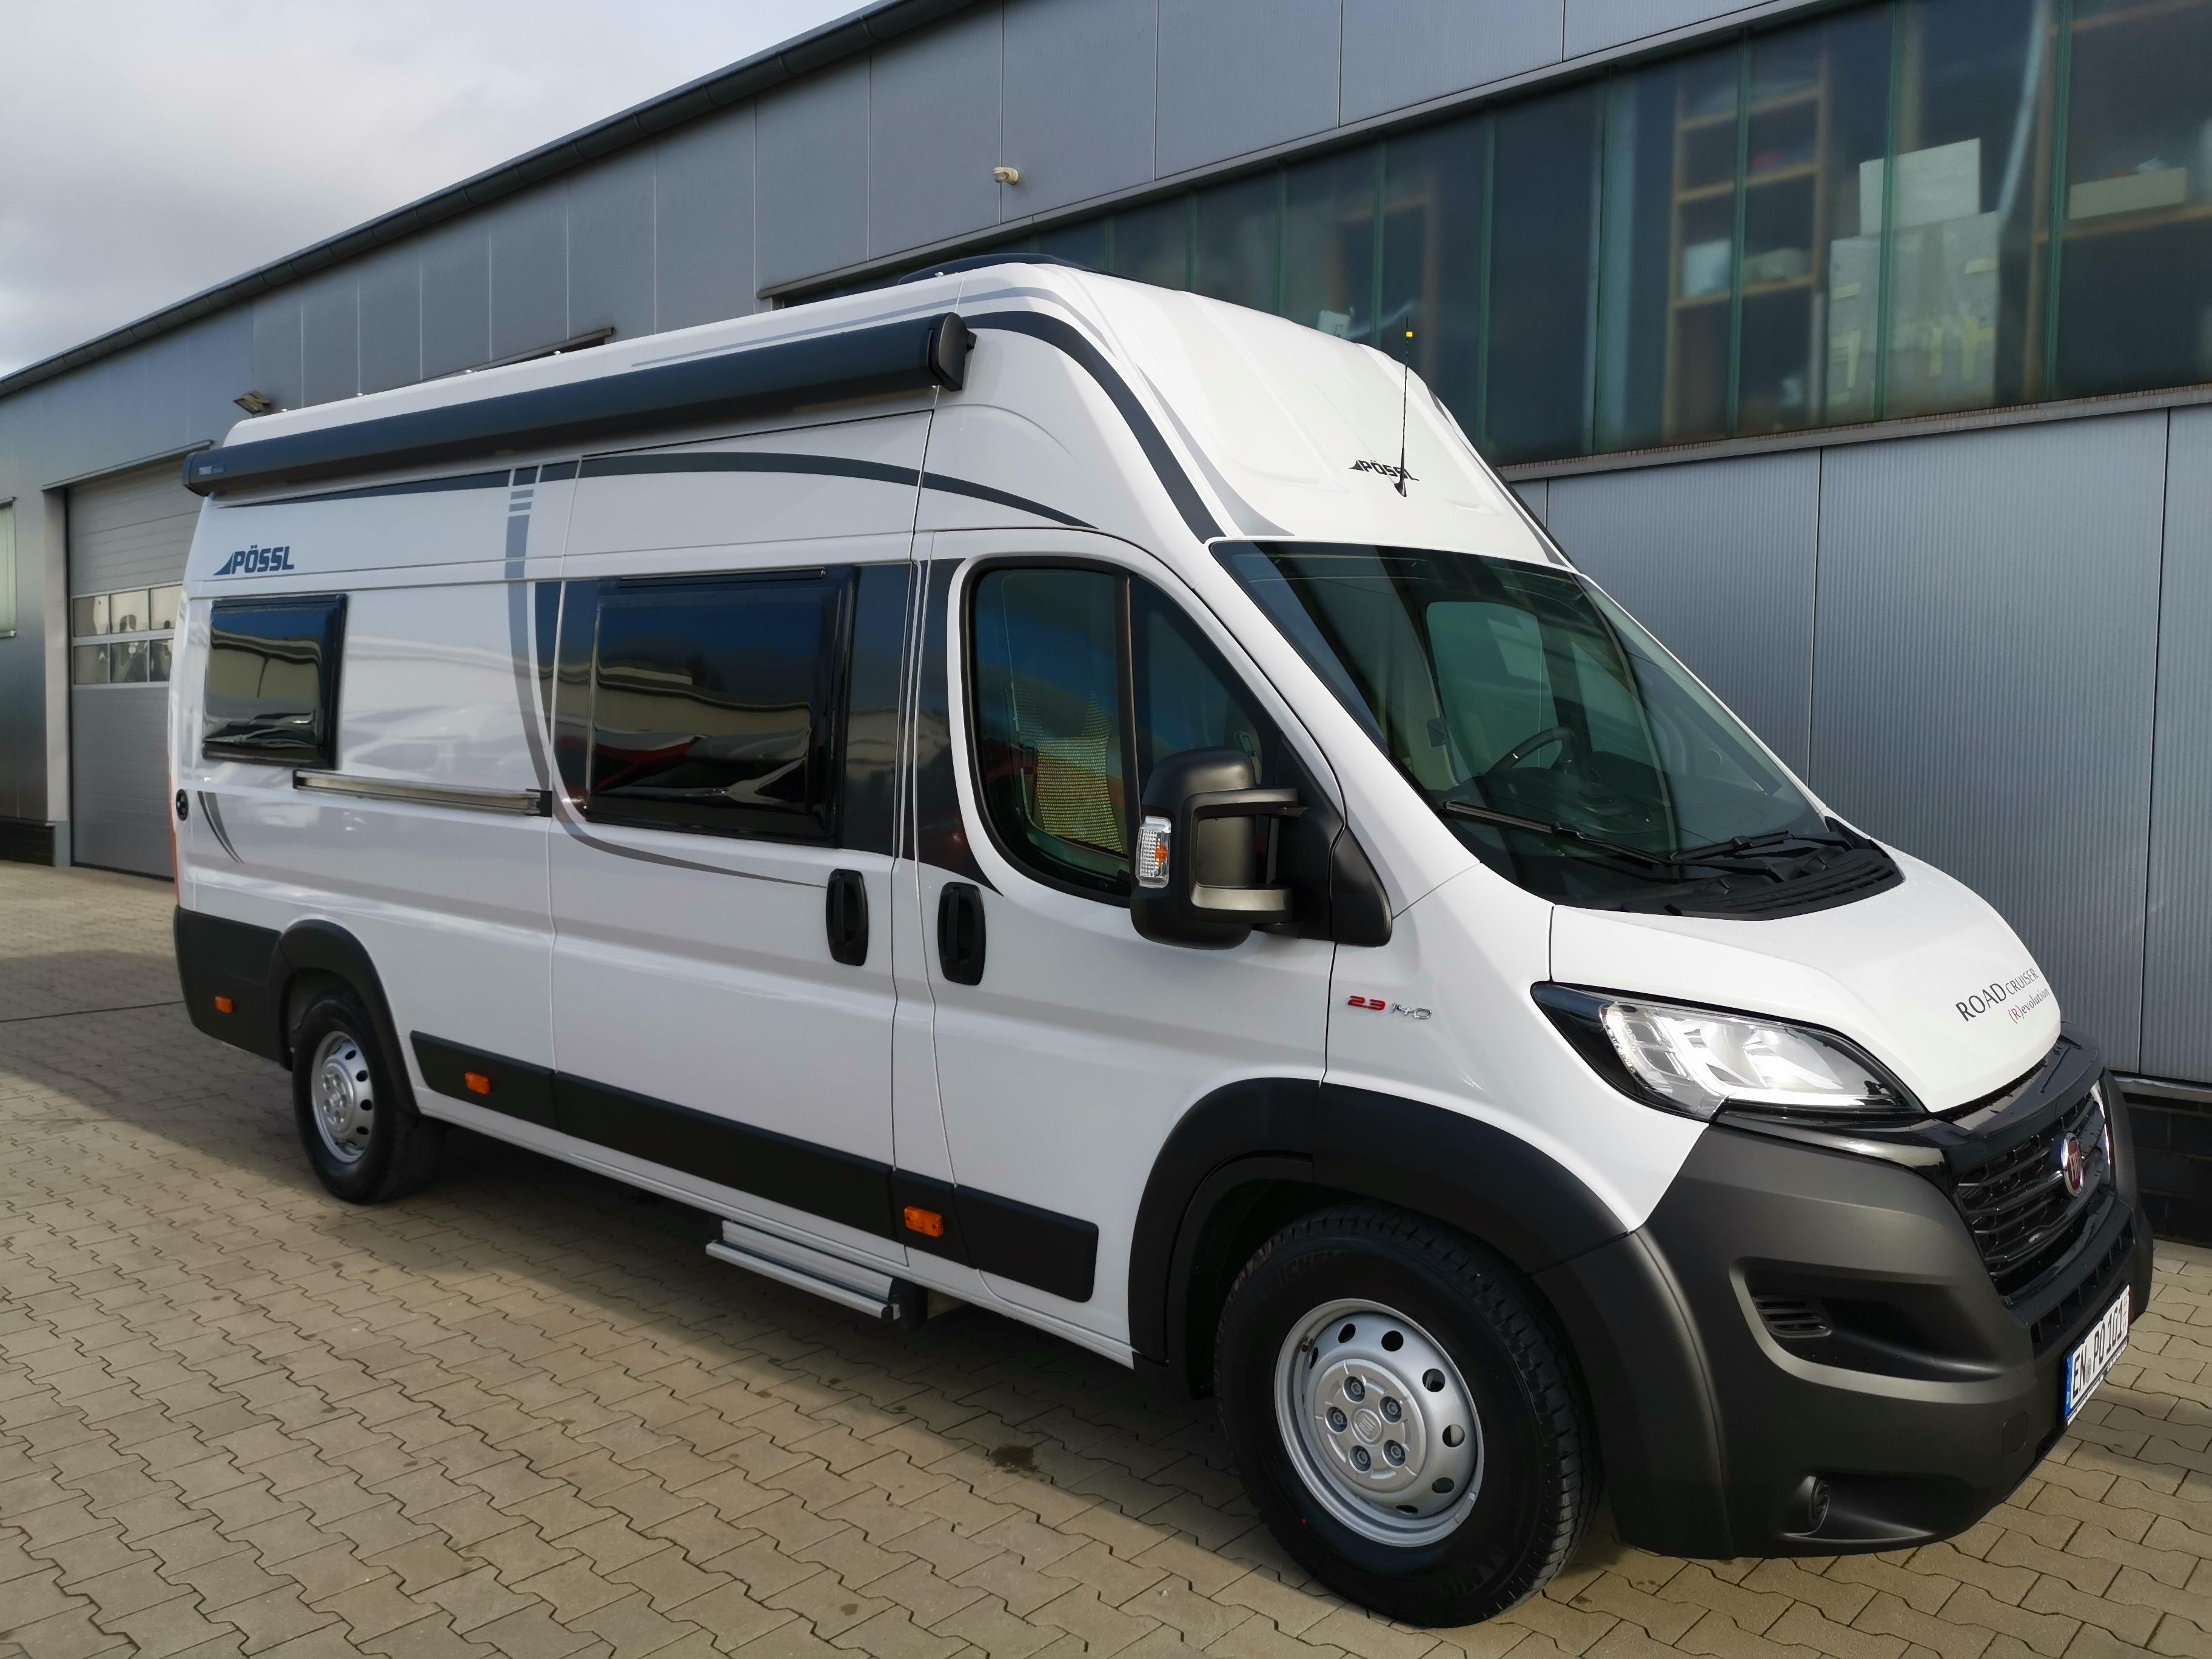 2020 Possl Roadcuiser 2020 Xl Motor Home Class B Rental In Munchen Outdoorsy